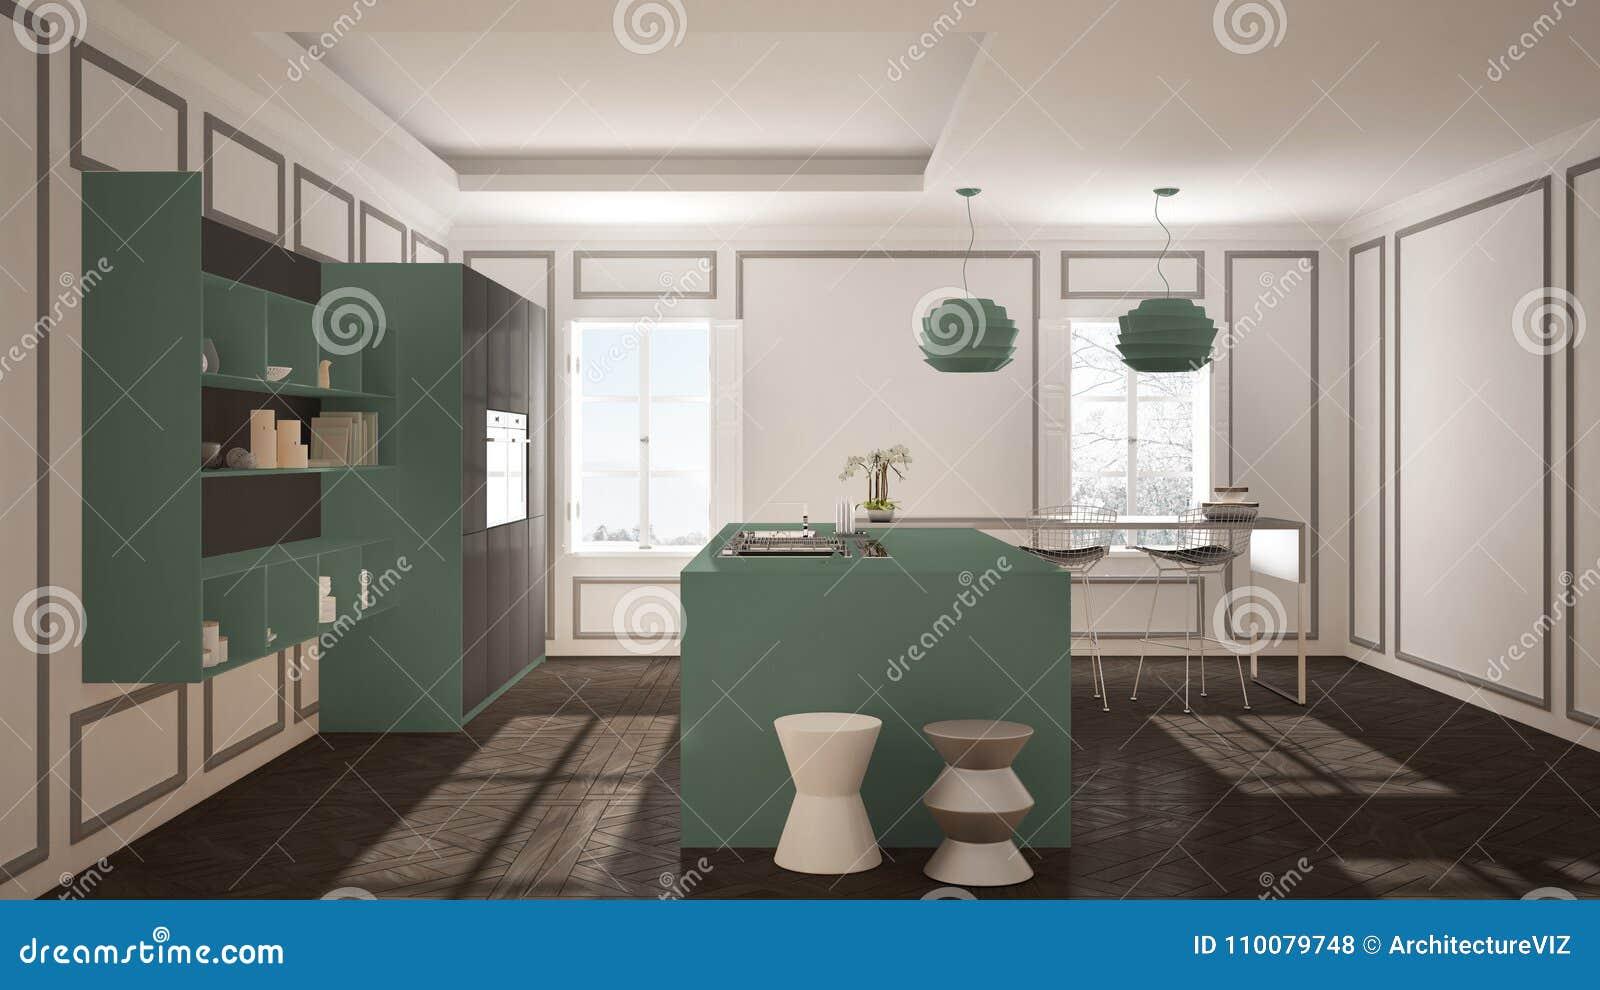 old kitchen furniture. Modern Kitchen Furniture In Classic Room, Old Parquet, Minimalis Stock Illustration - Of Inside, Mansion: 110079748